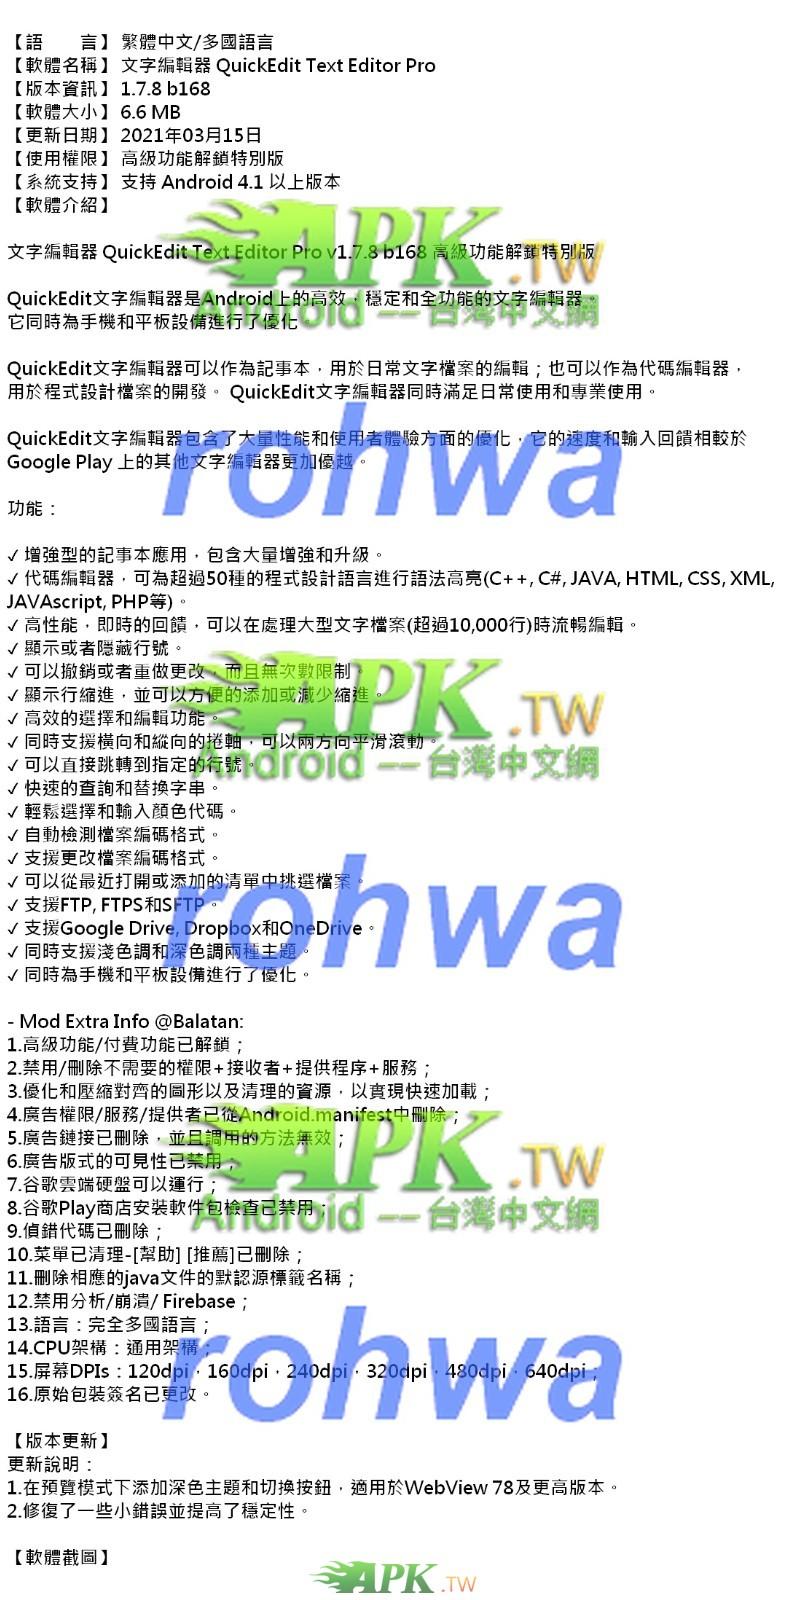 QuickEdit_Pro_1.7.8_b168_.jpg